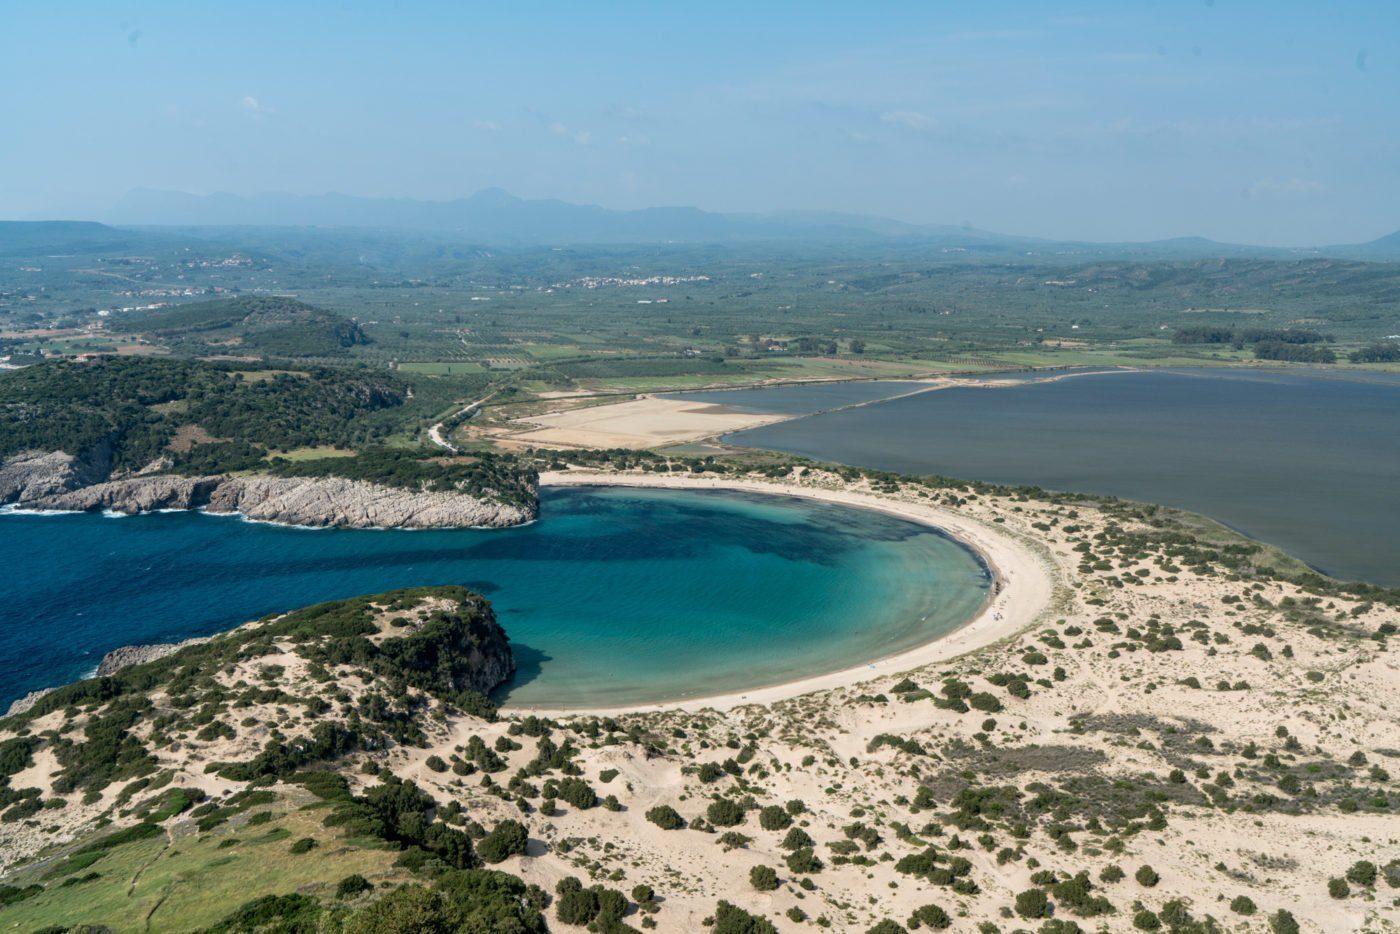 Voidikilia beach or Omega beach in the Greek Peloponnese